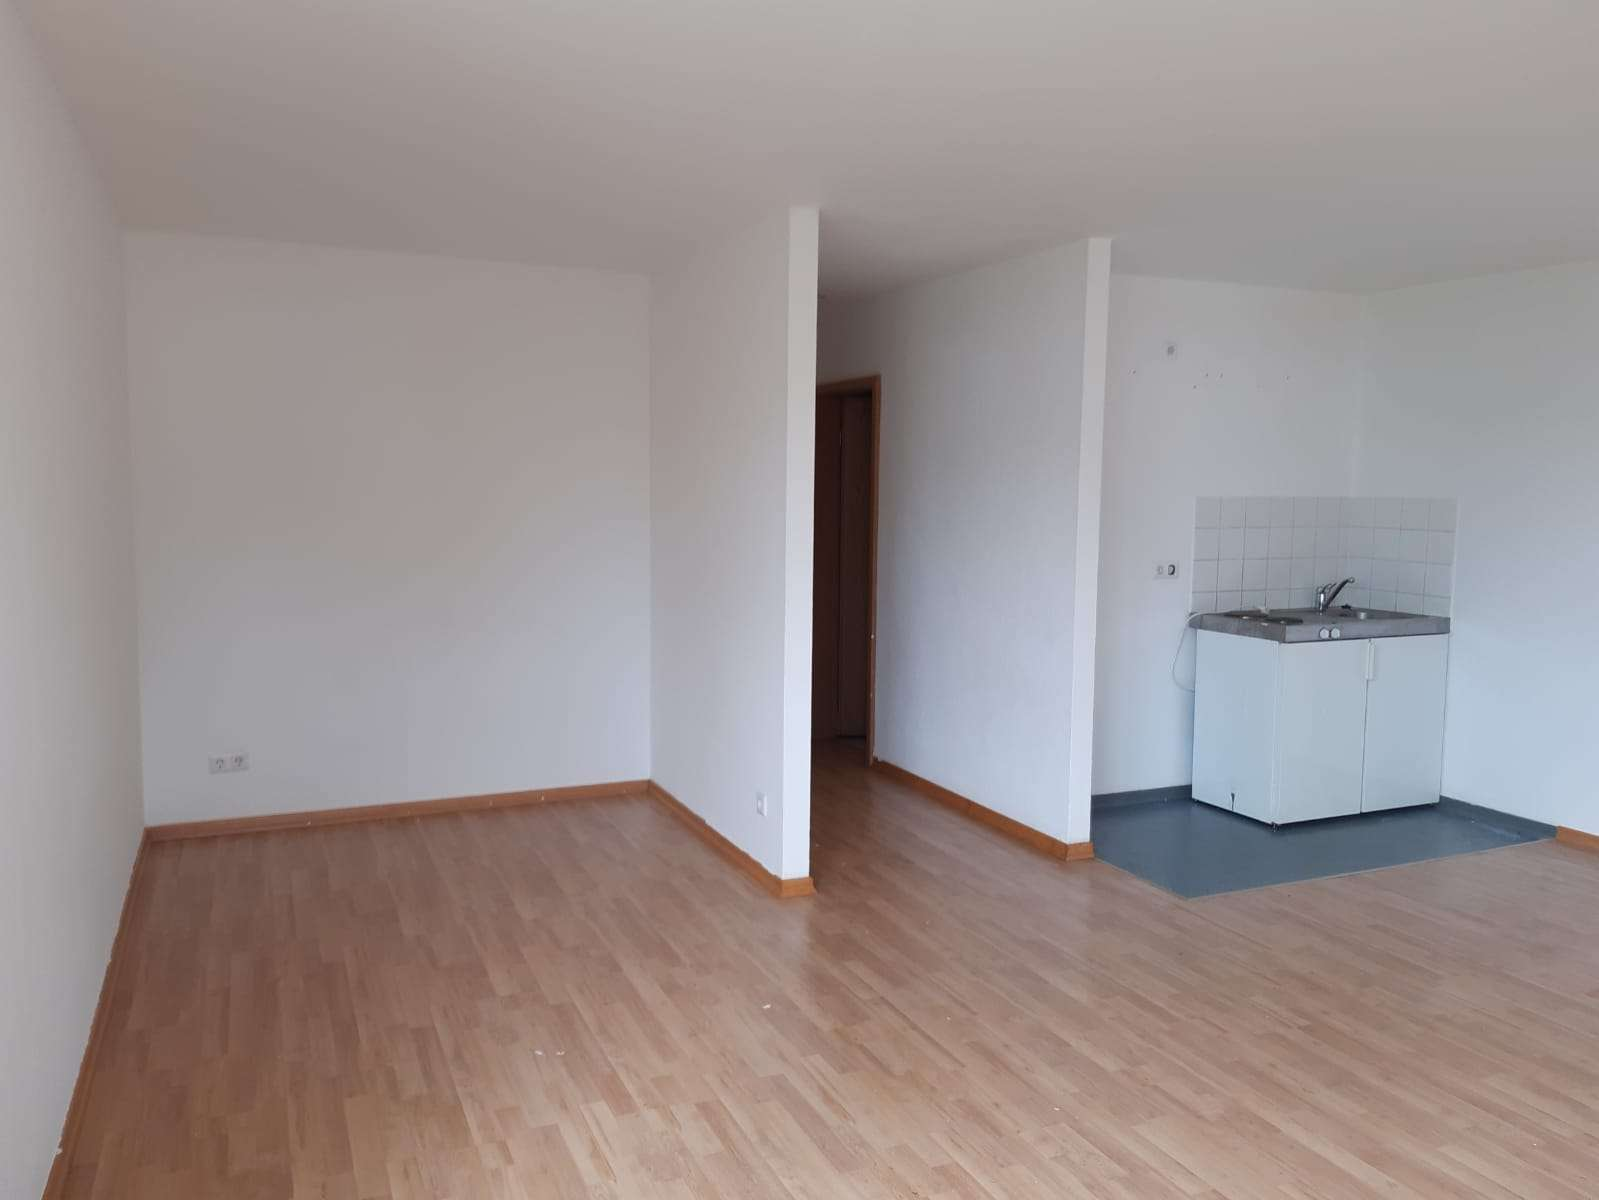 Helles 1-Zimmer-Apartment in zentraler Lage von Hof in